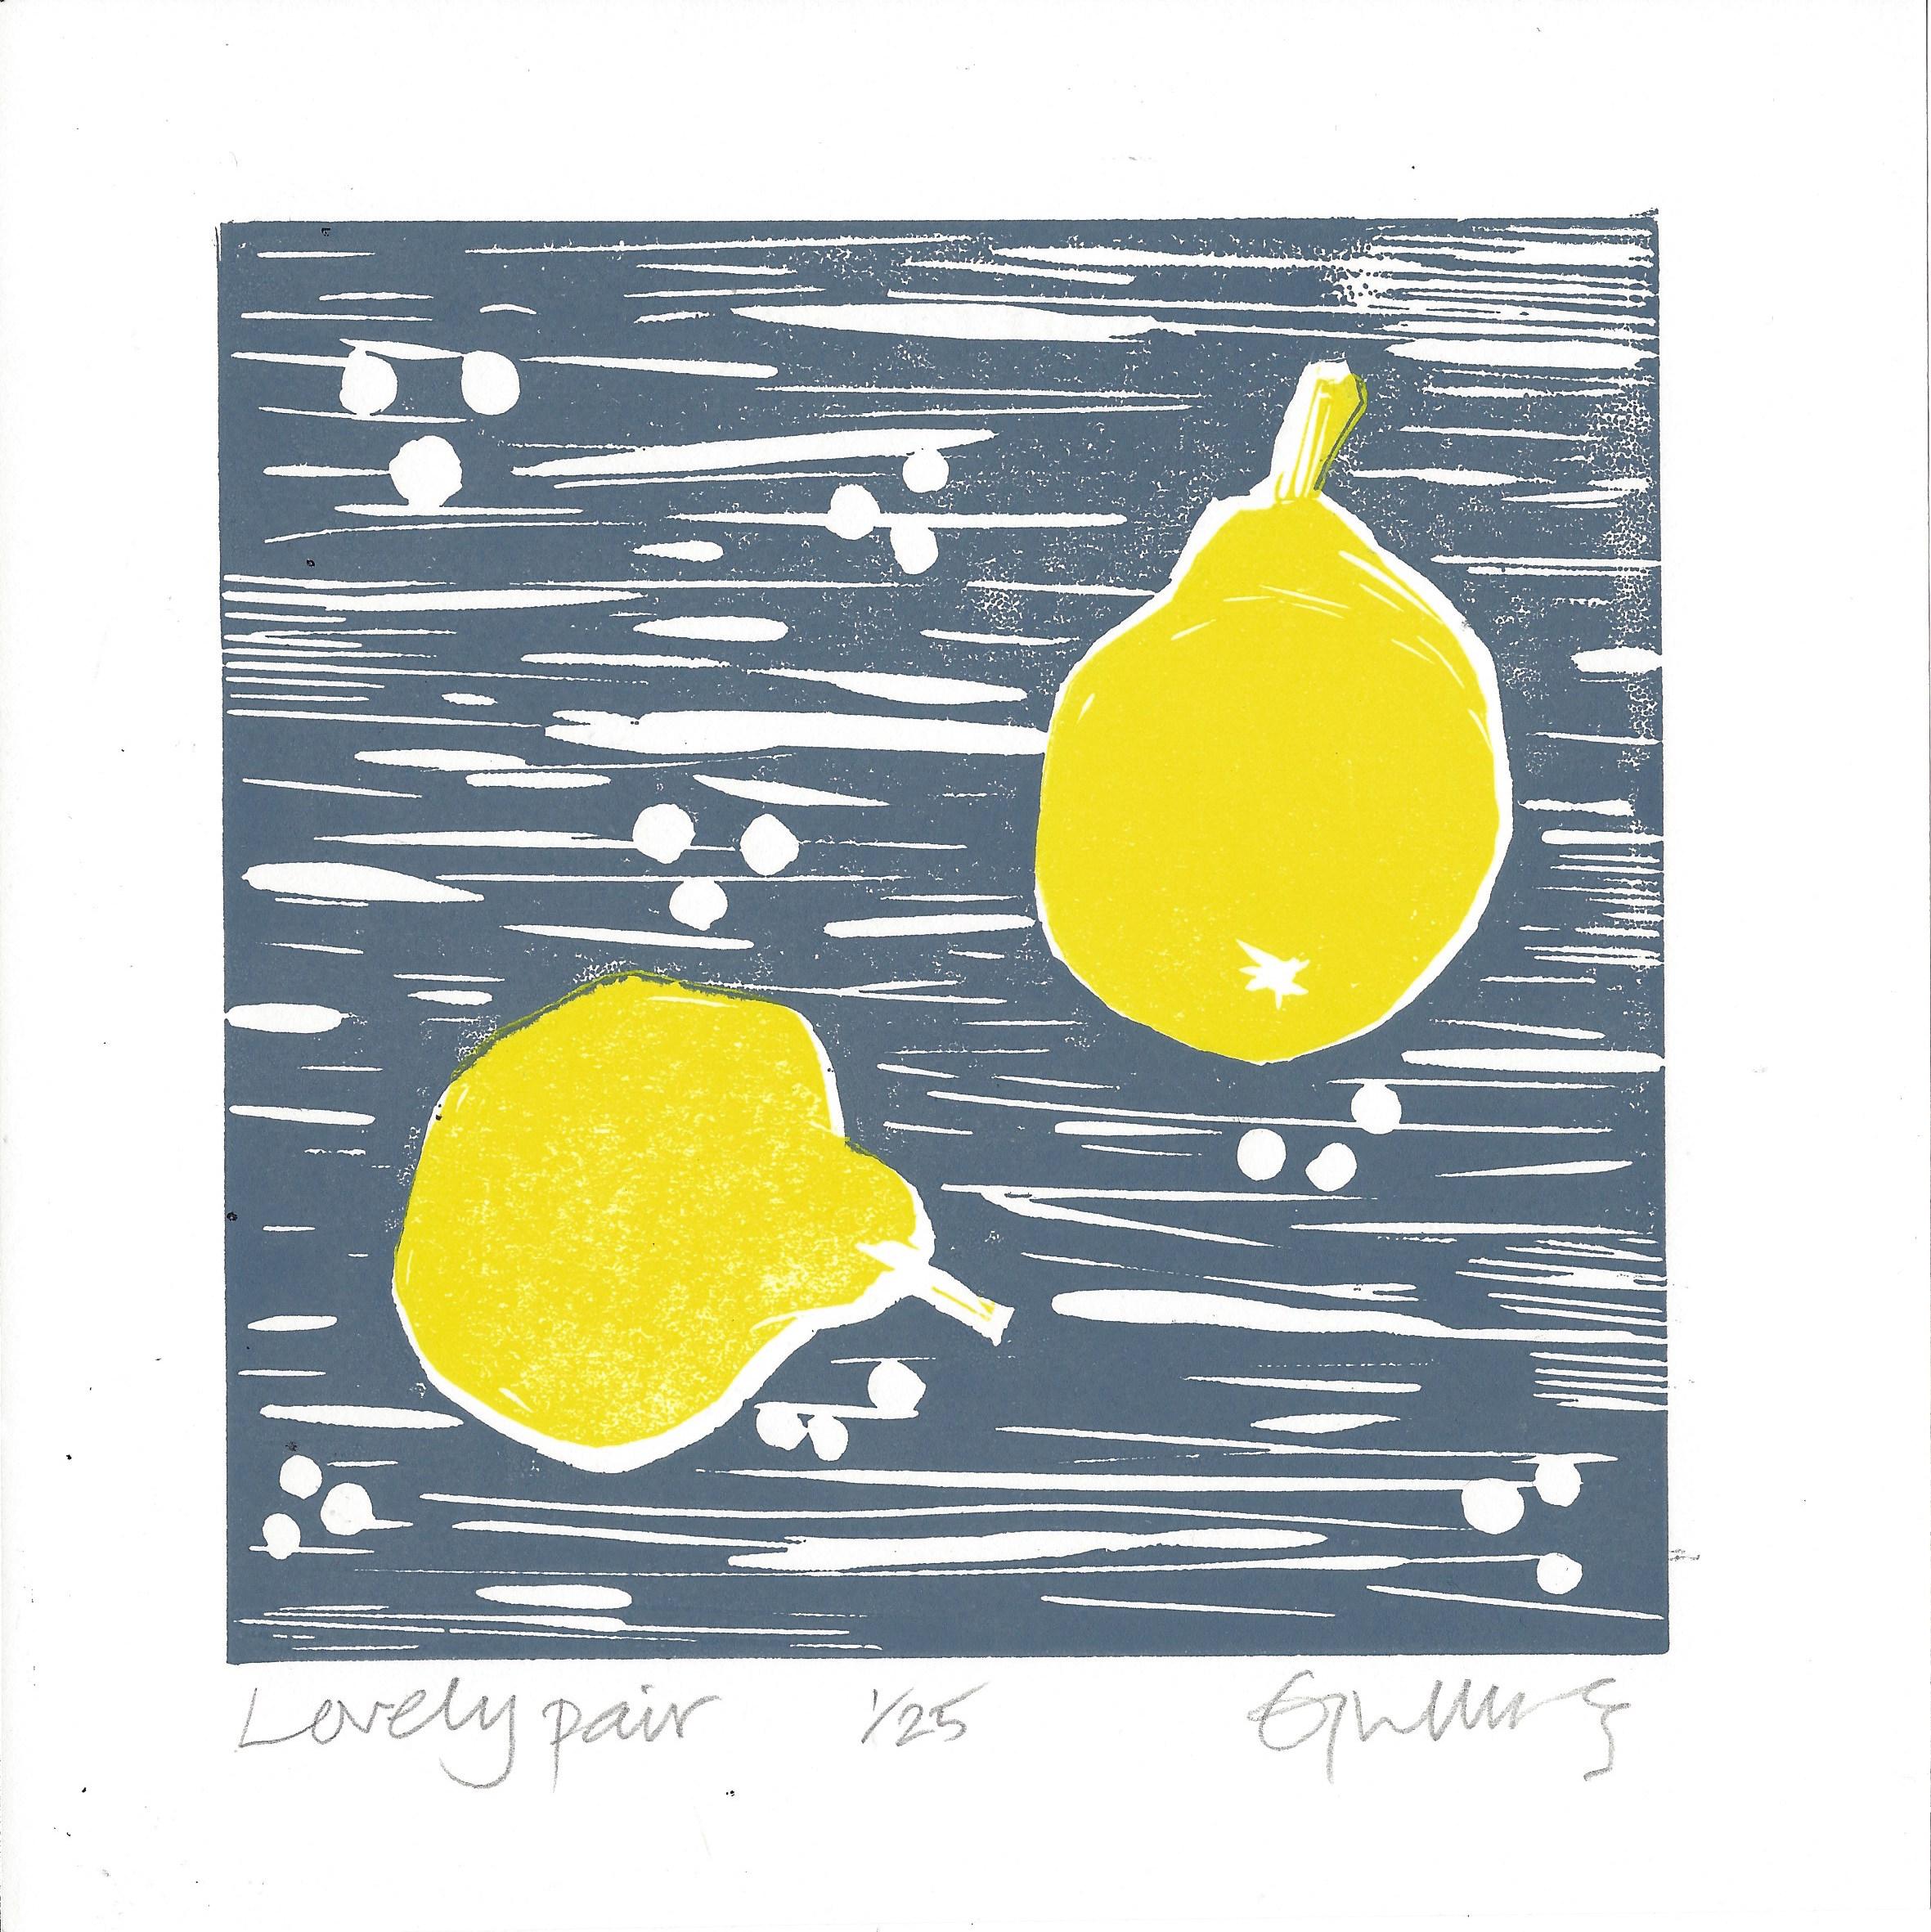 Lovely Pair - G Tulberg - Hazelnut Press